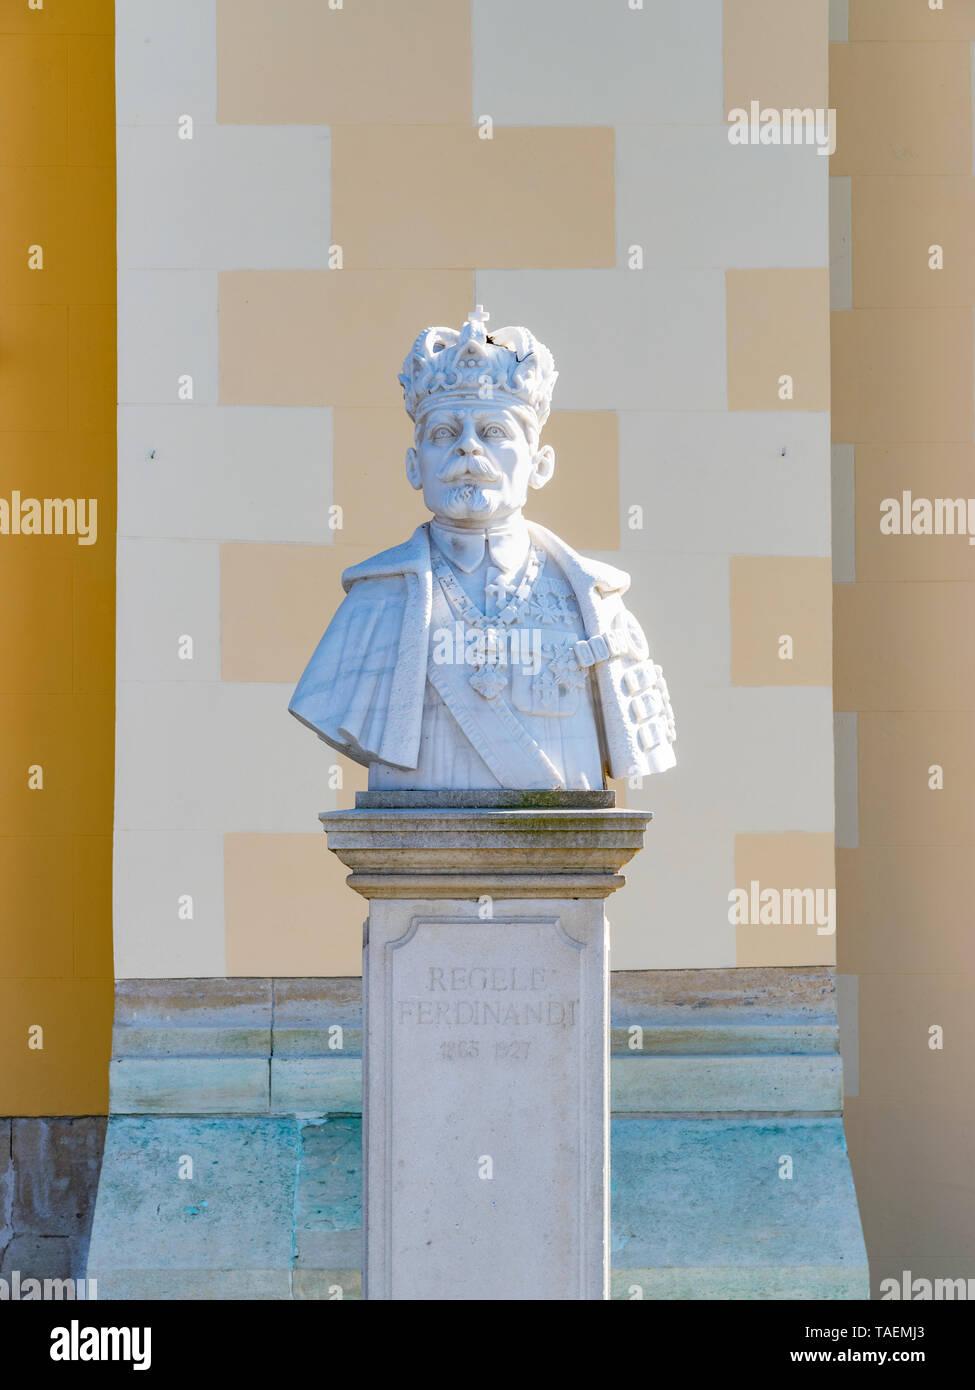 ALBA IULIA, ROMANIA - February 28, 2019: Statue of the Ferdinand I of Romania in Alba Iulia, Romania. Stock Photo